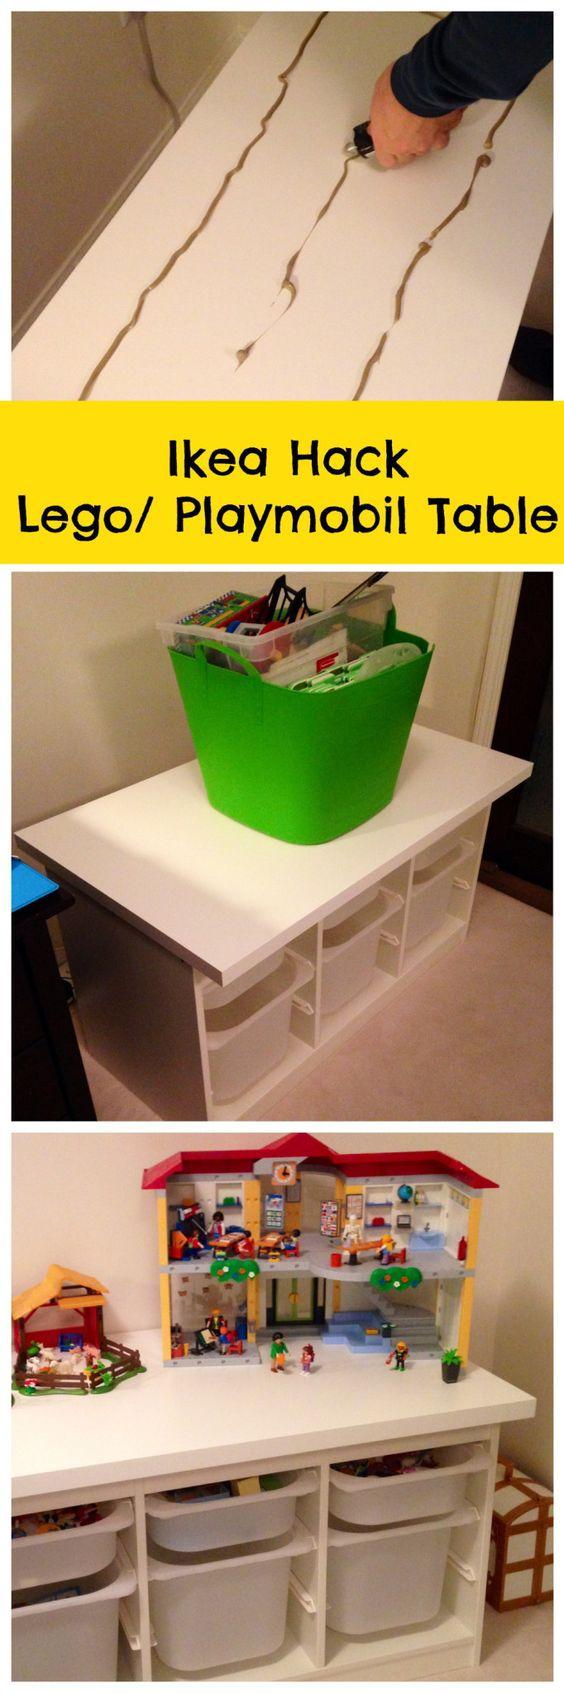 playmobil d tournement de meubles ikea and hacks on pinterest. Black Bedroom Furniture Sets. Home Design Ideas